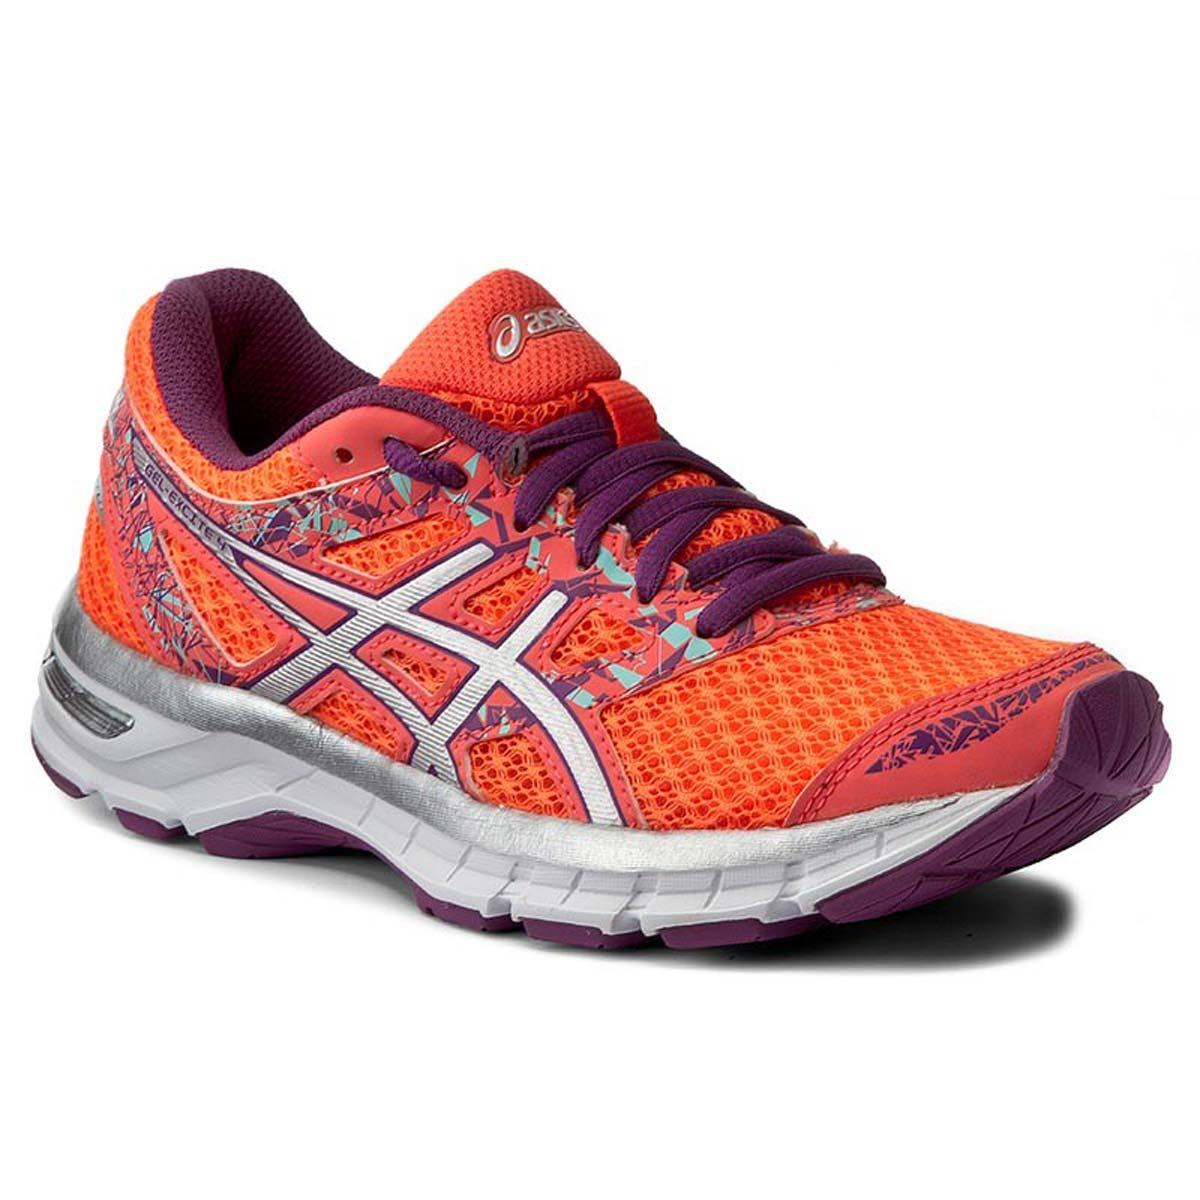 Running ShoescoralsilverorchidOnline Buy Gel Excite 4 Asics uTFJc3Kl1